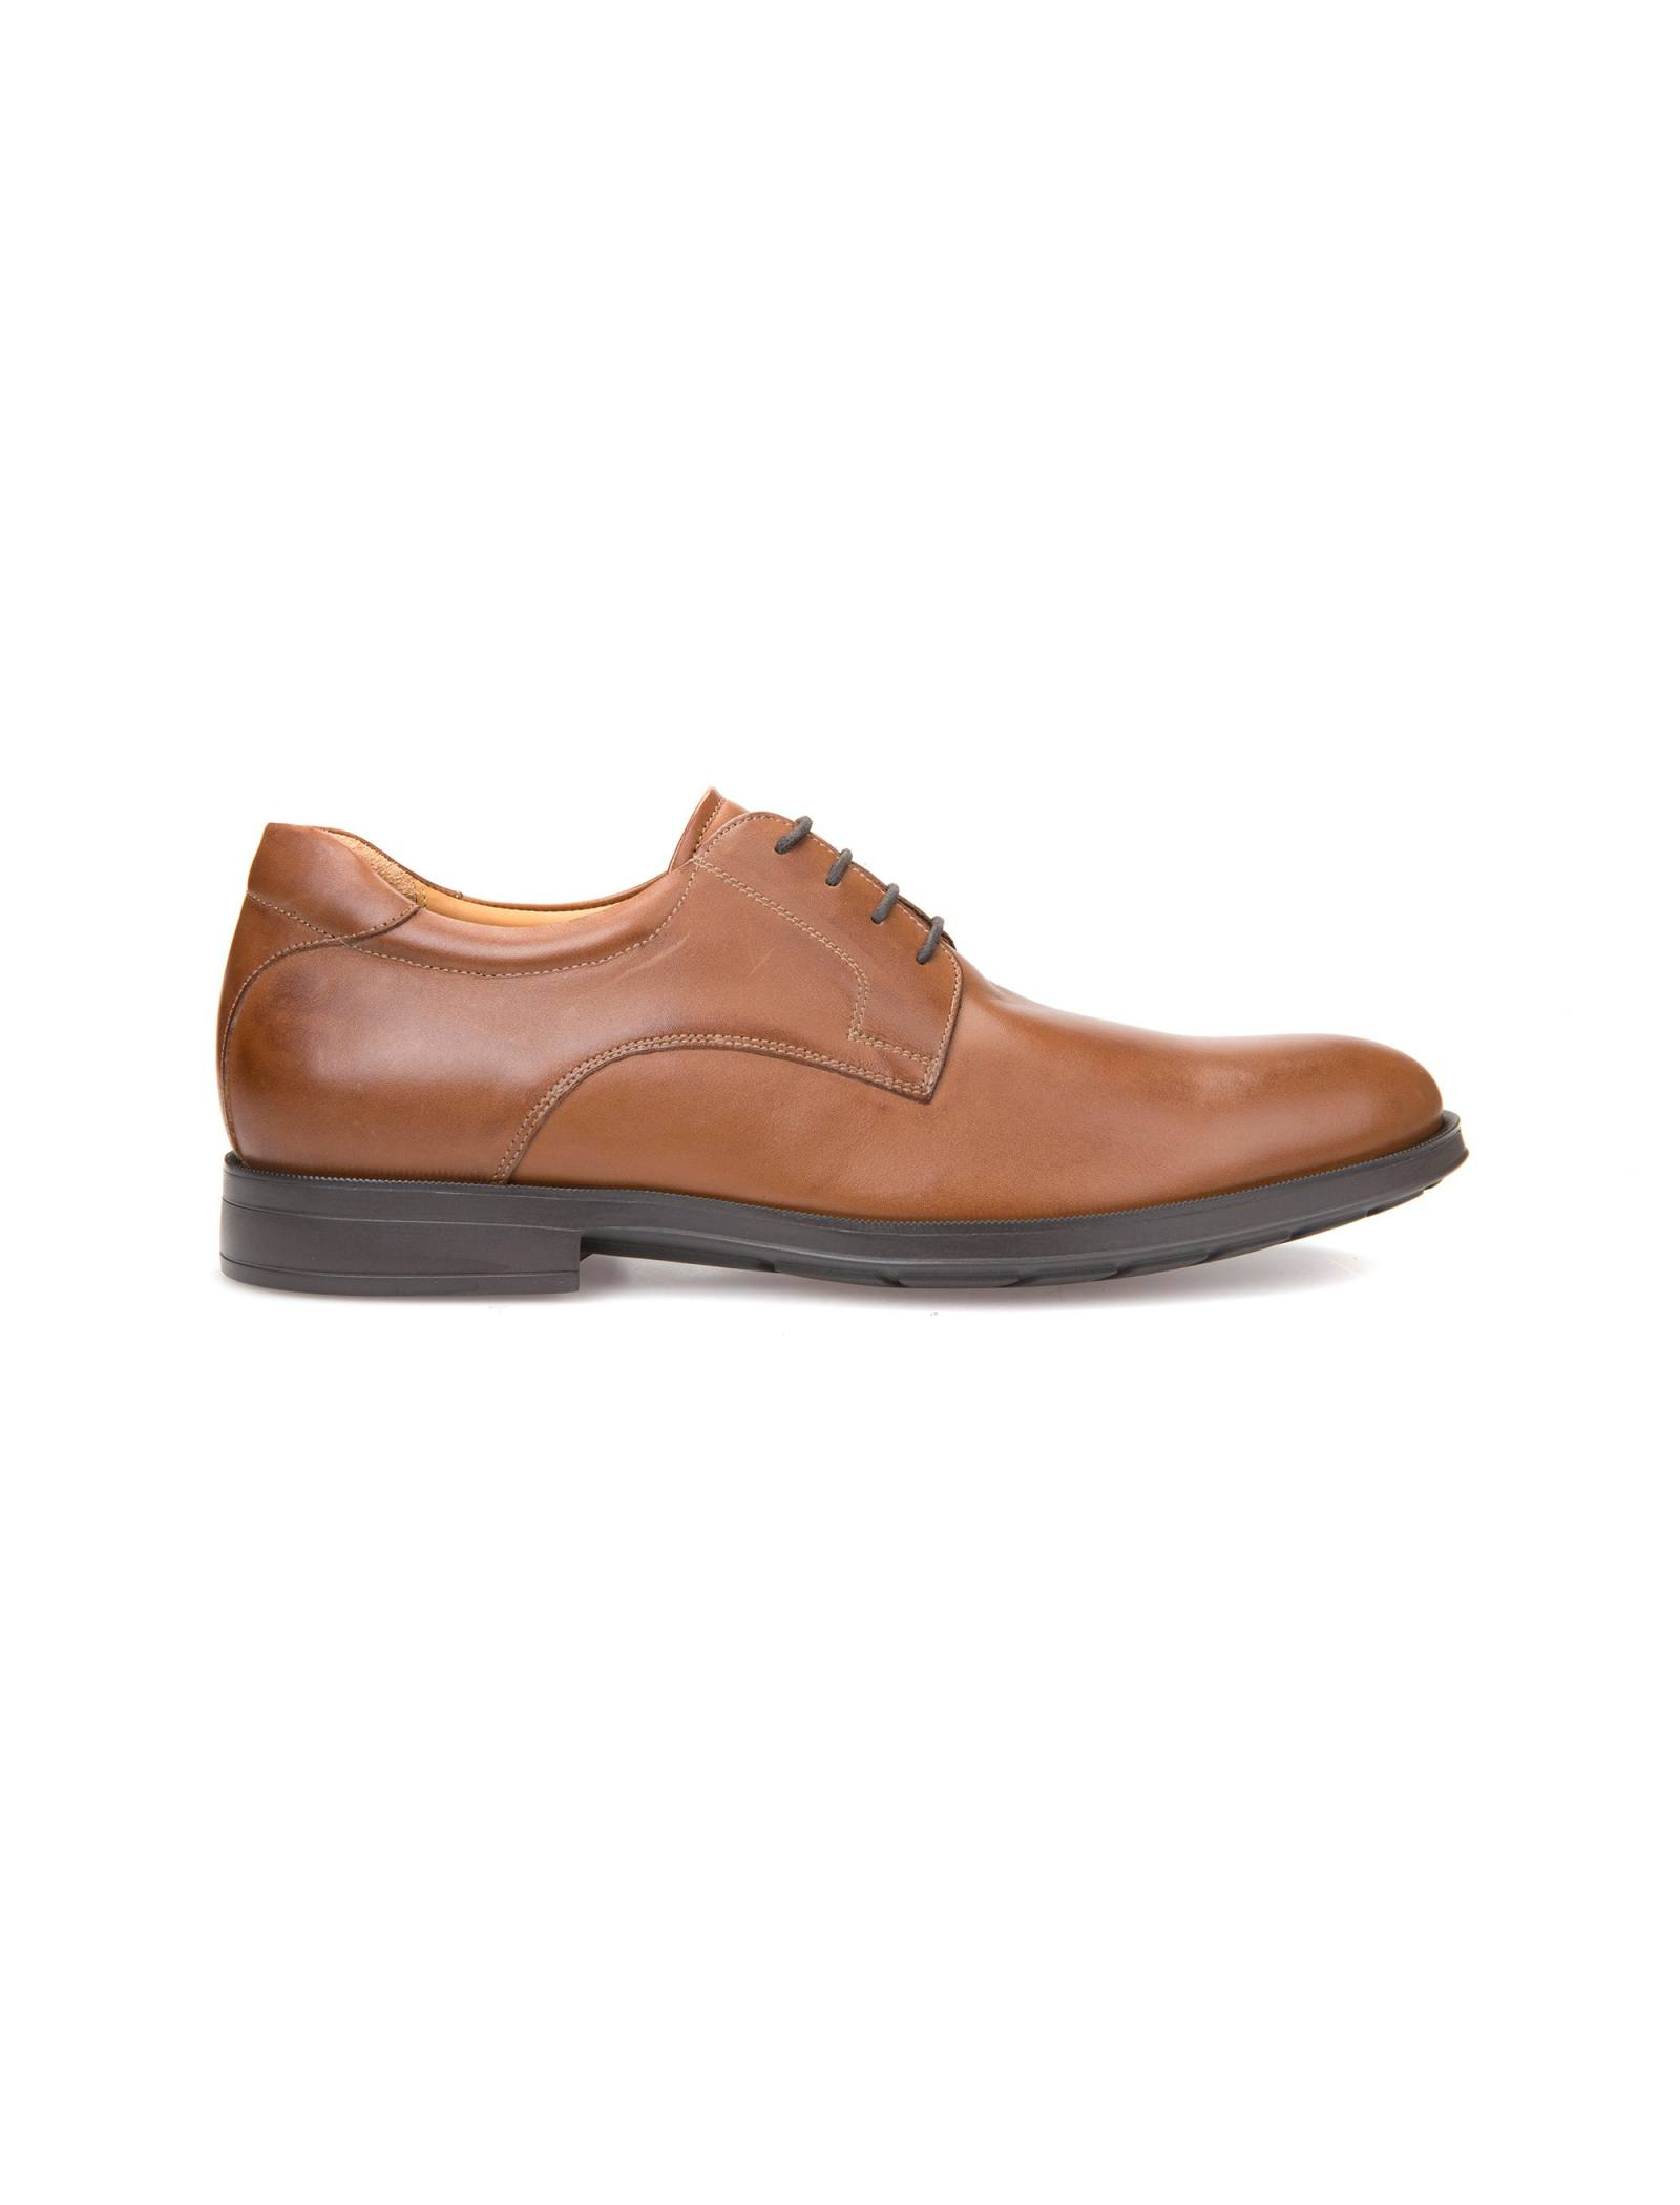 کفش اداری چرم مردانه Hilstone - جی اوکس - قهوه اي  - 1